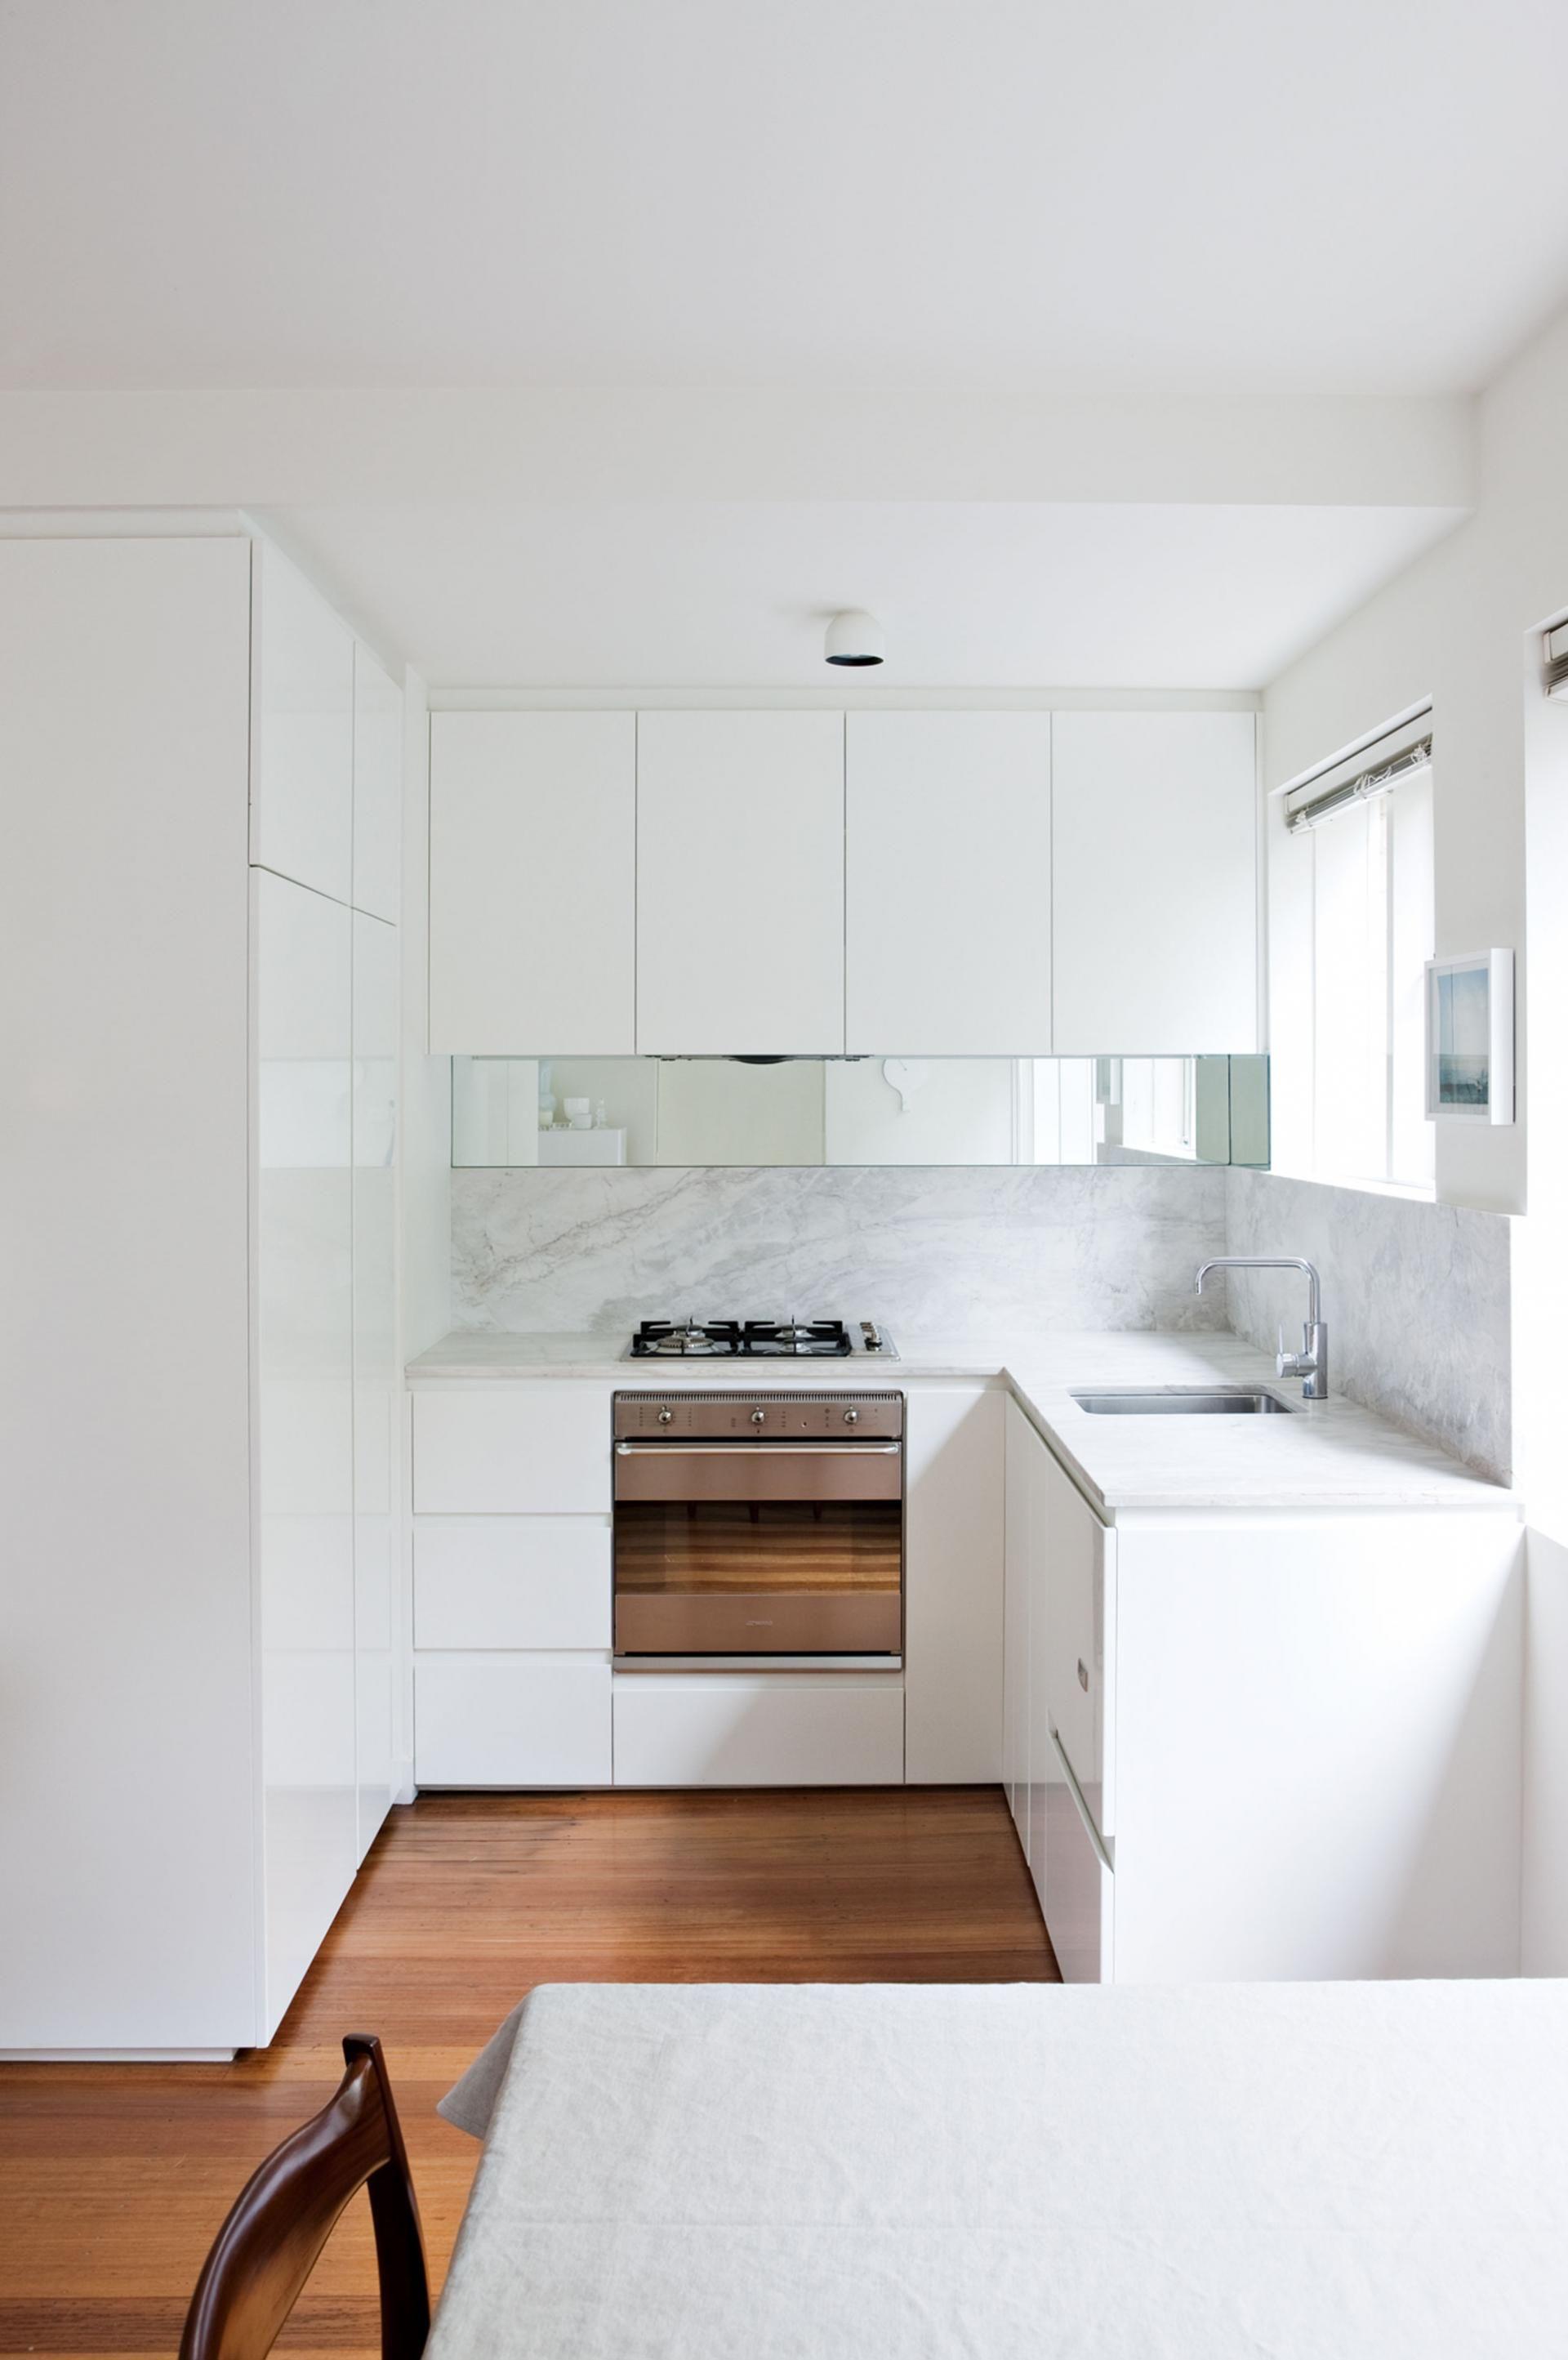 personalize of diy kitchen windows small kitchen renovations small white kitchens kitchen on interior design kitchen small modern id=27081